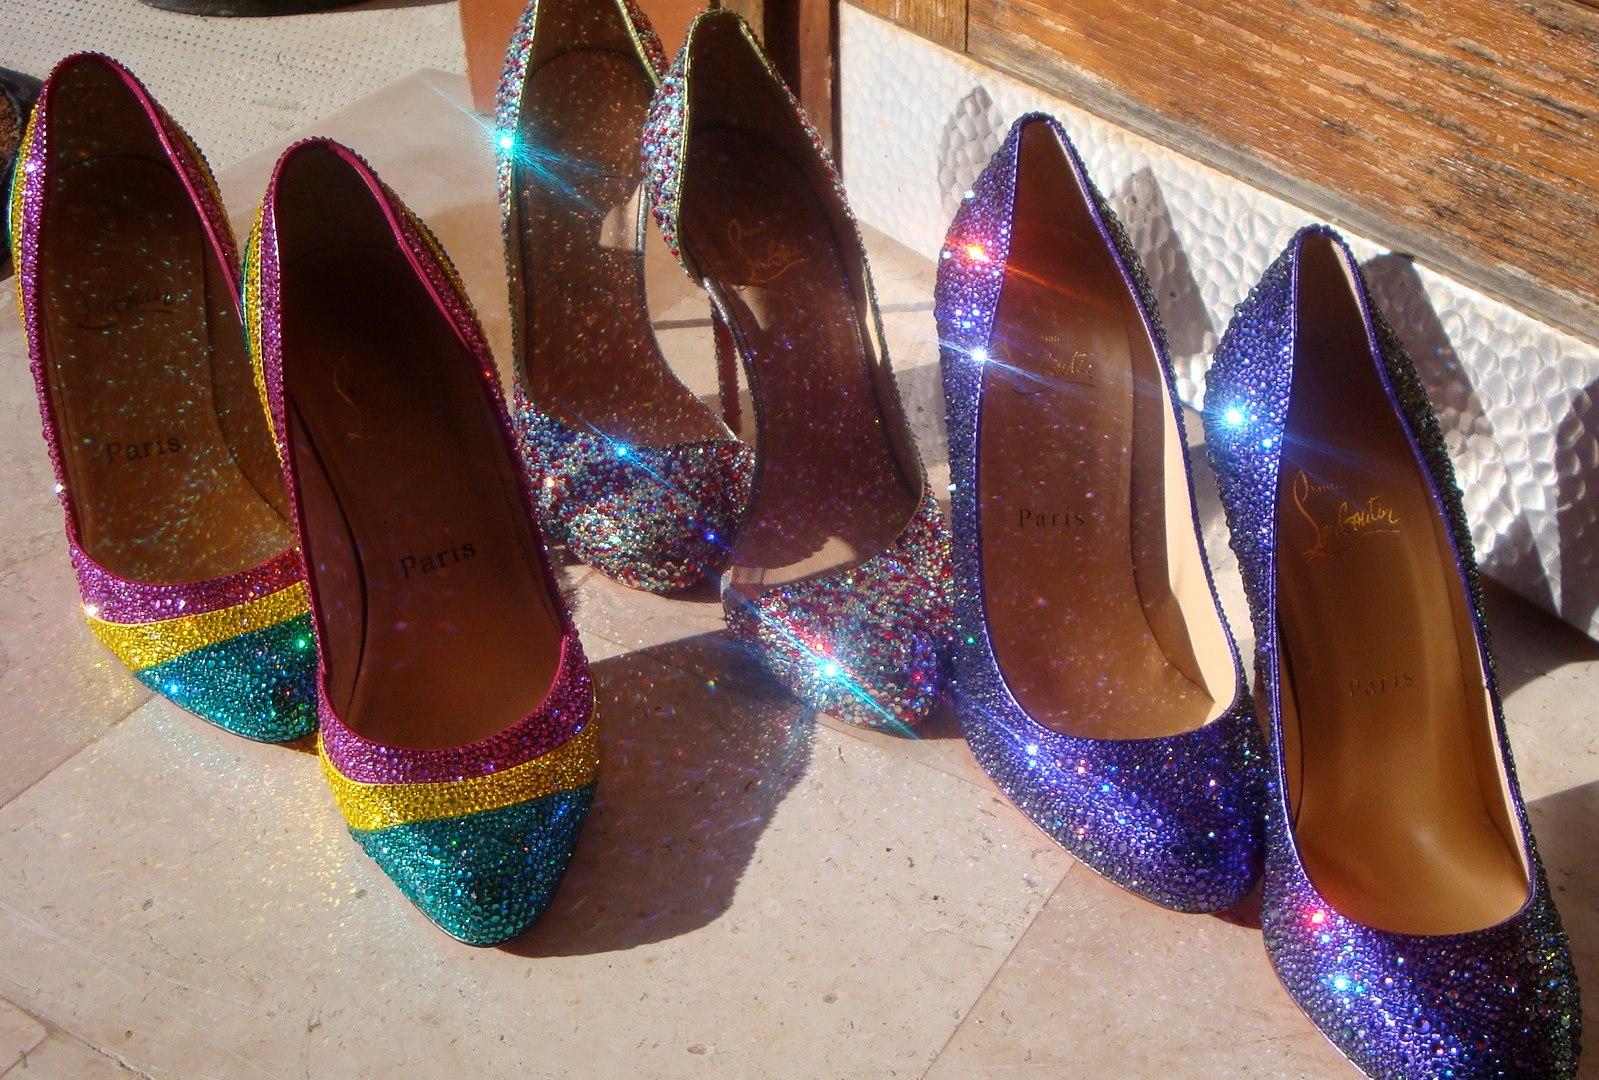 Redo my shoes